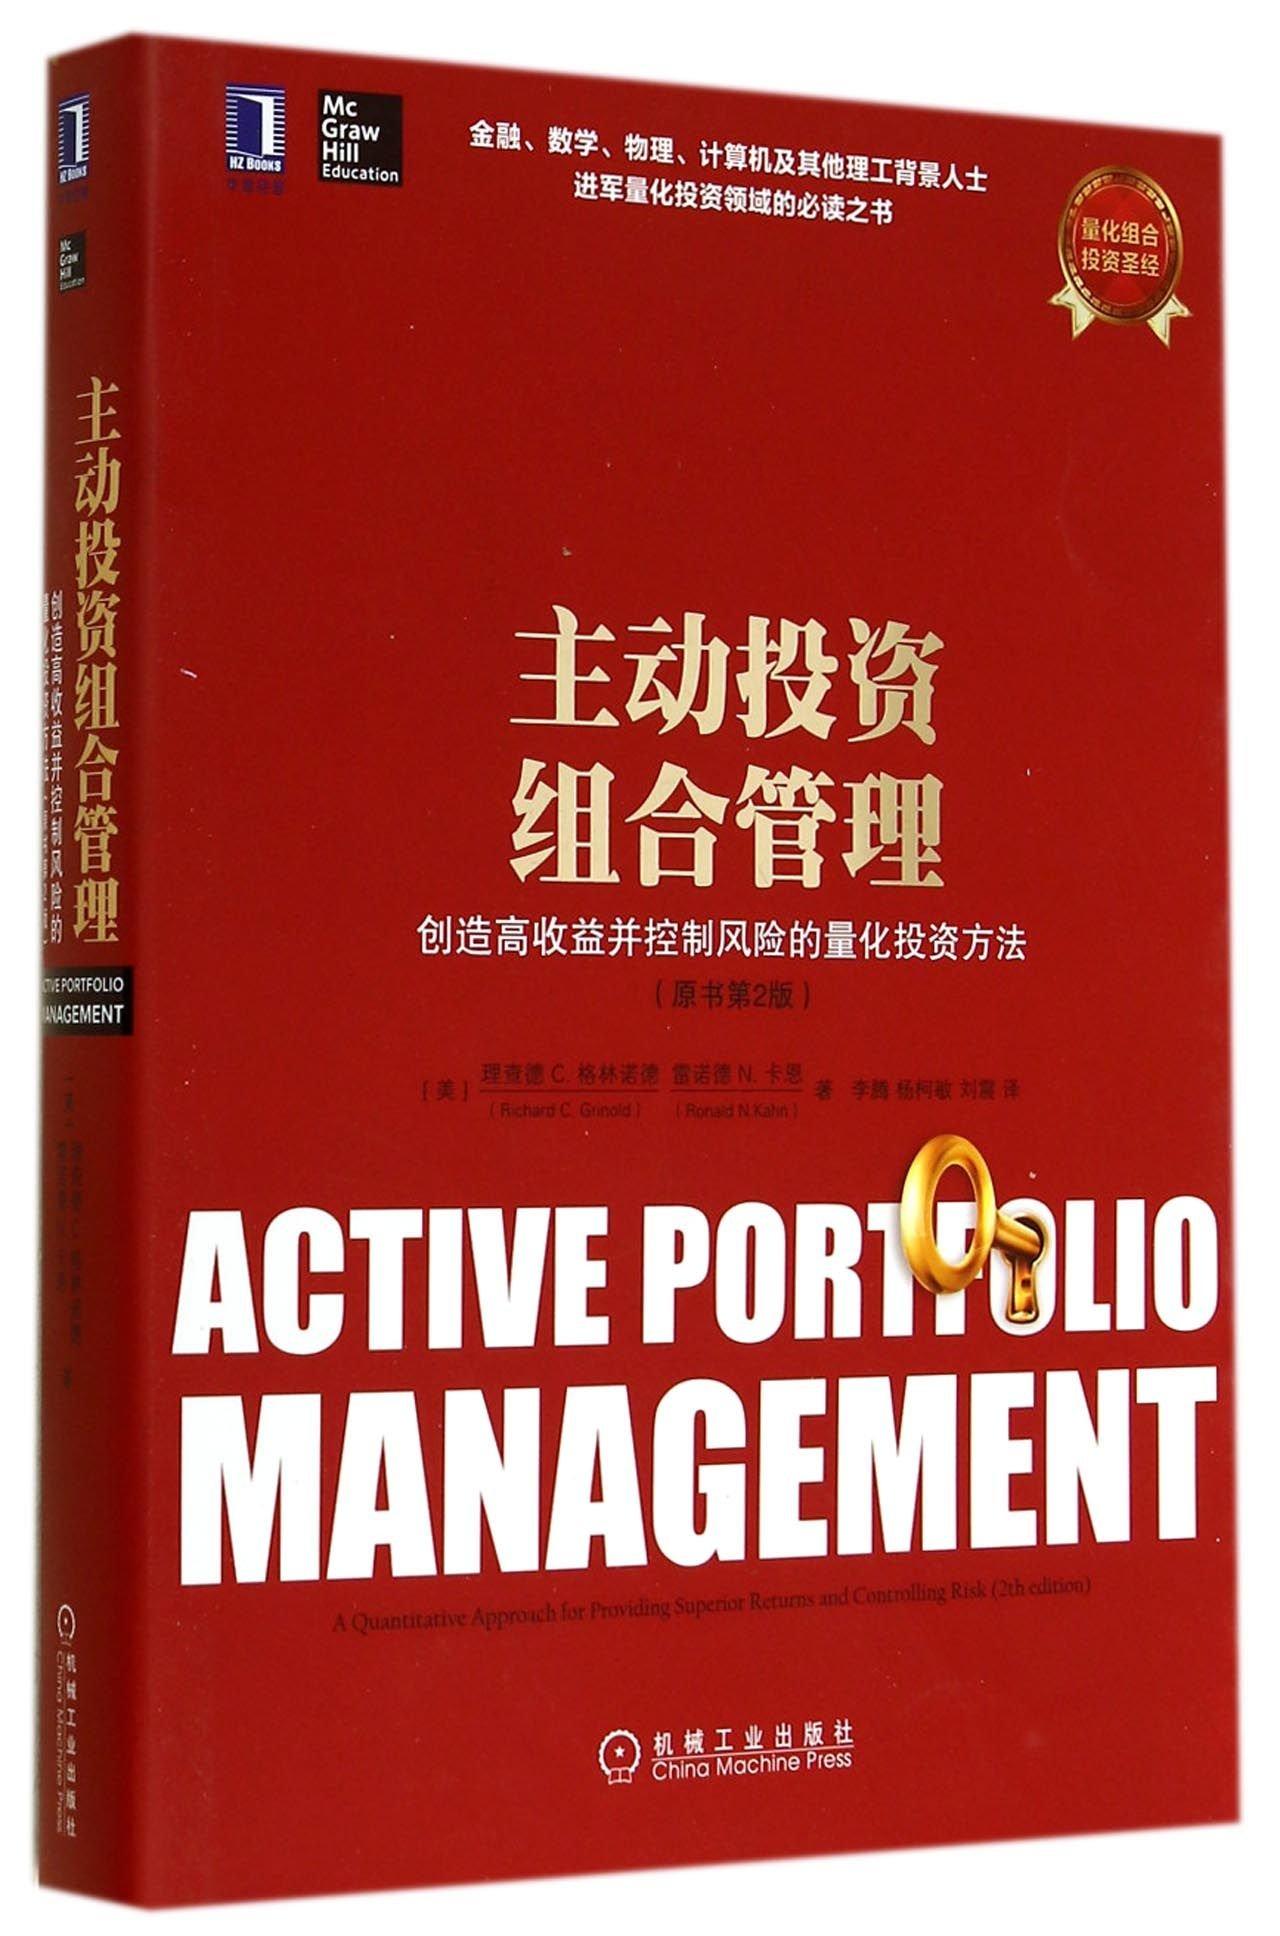 Read Online Active Portfolio Management: A Quantitative Approac(Chinese Edition) pdf